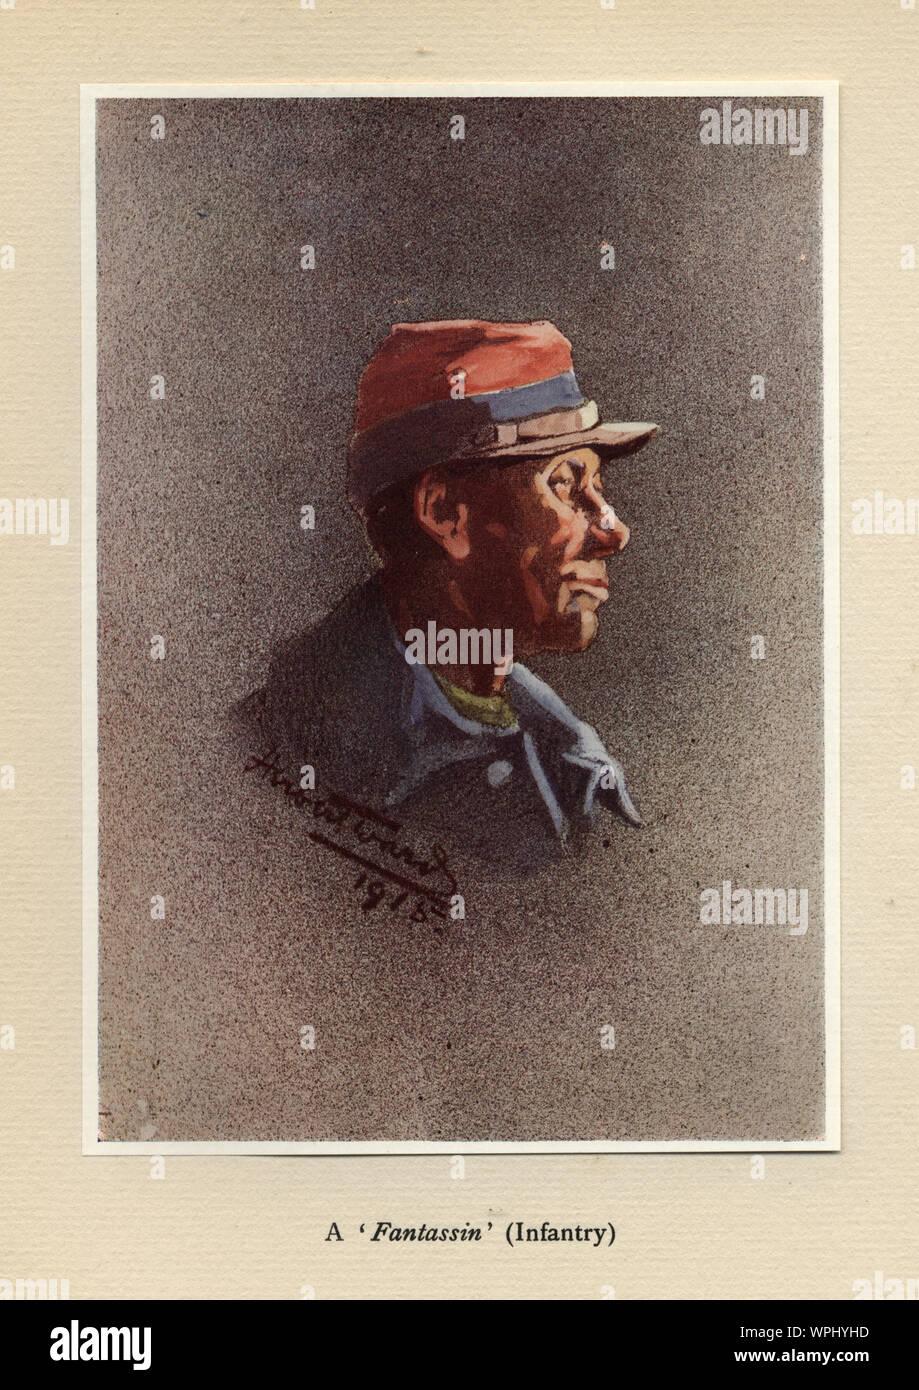 World Ward One, French soldier, Fantassin, Infantry, 1915. Mr Poilu, by Herbert Ward. Stock Photo